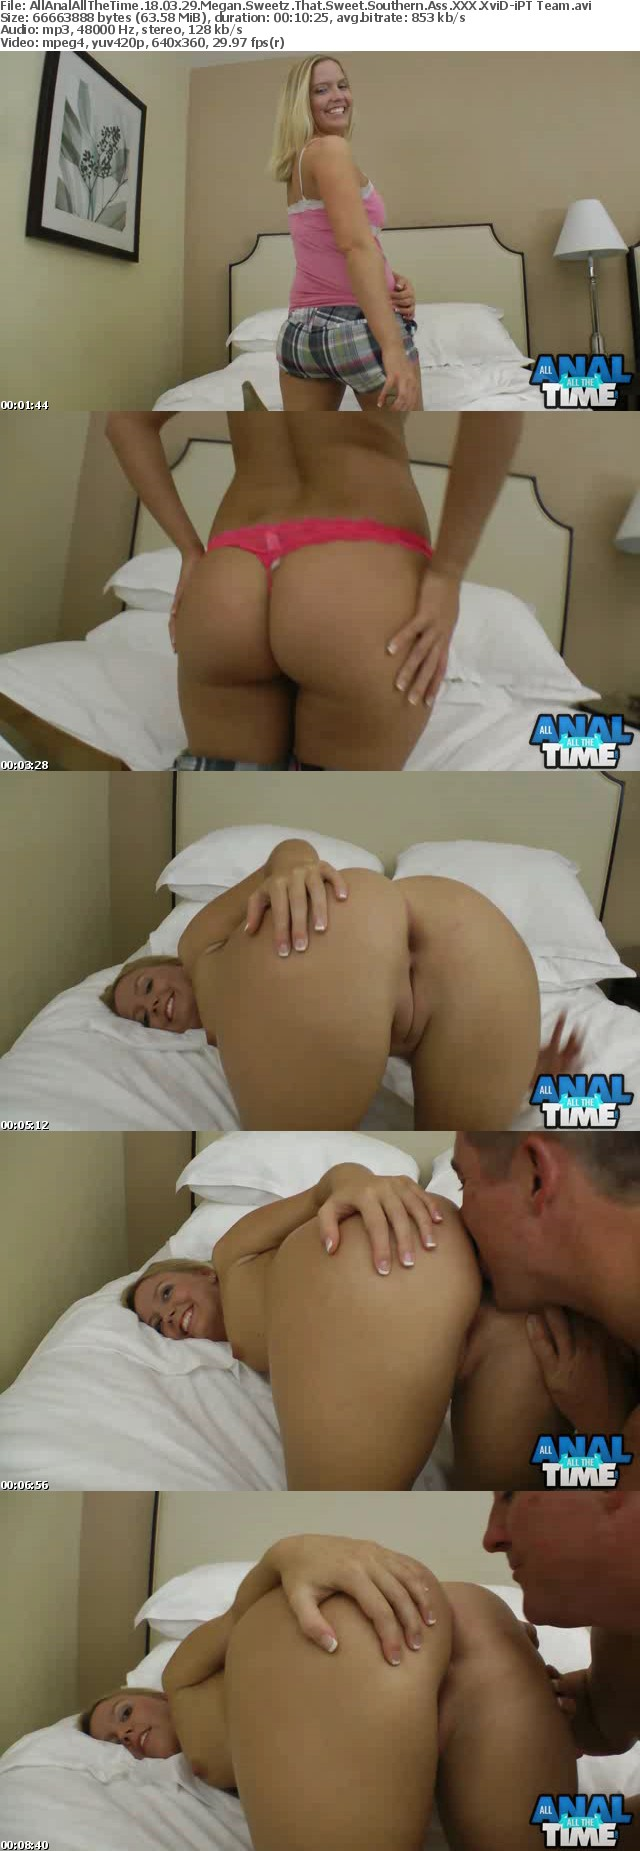 AllAnalAllTheTime 18 03 29 Megan Sweetz That Sweet Southern Ass XXX